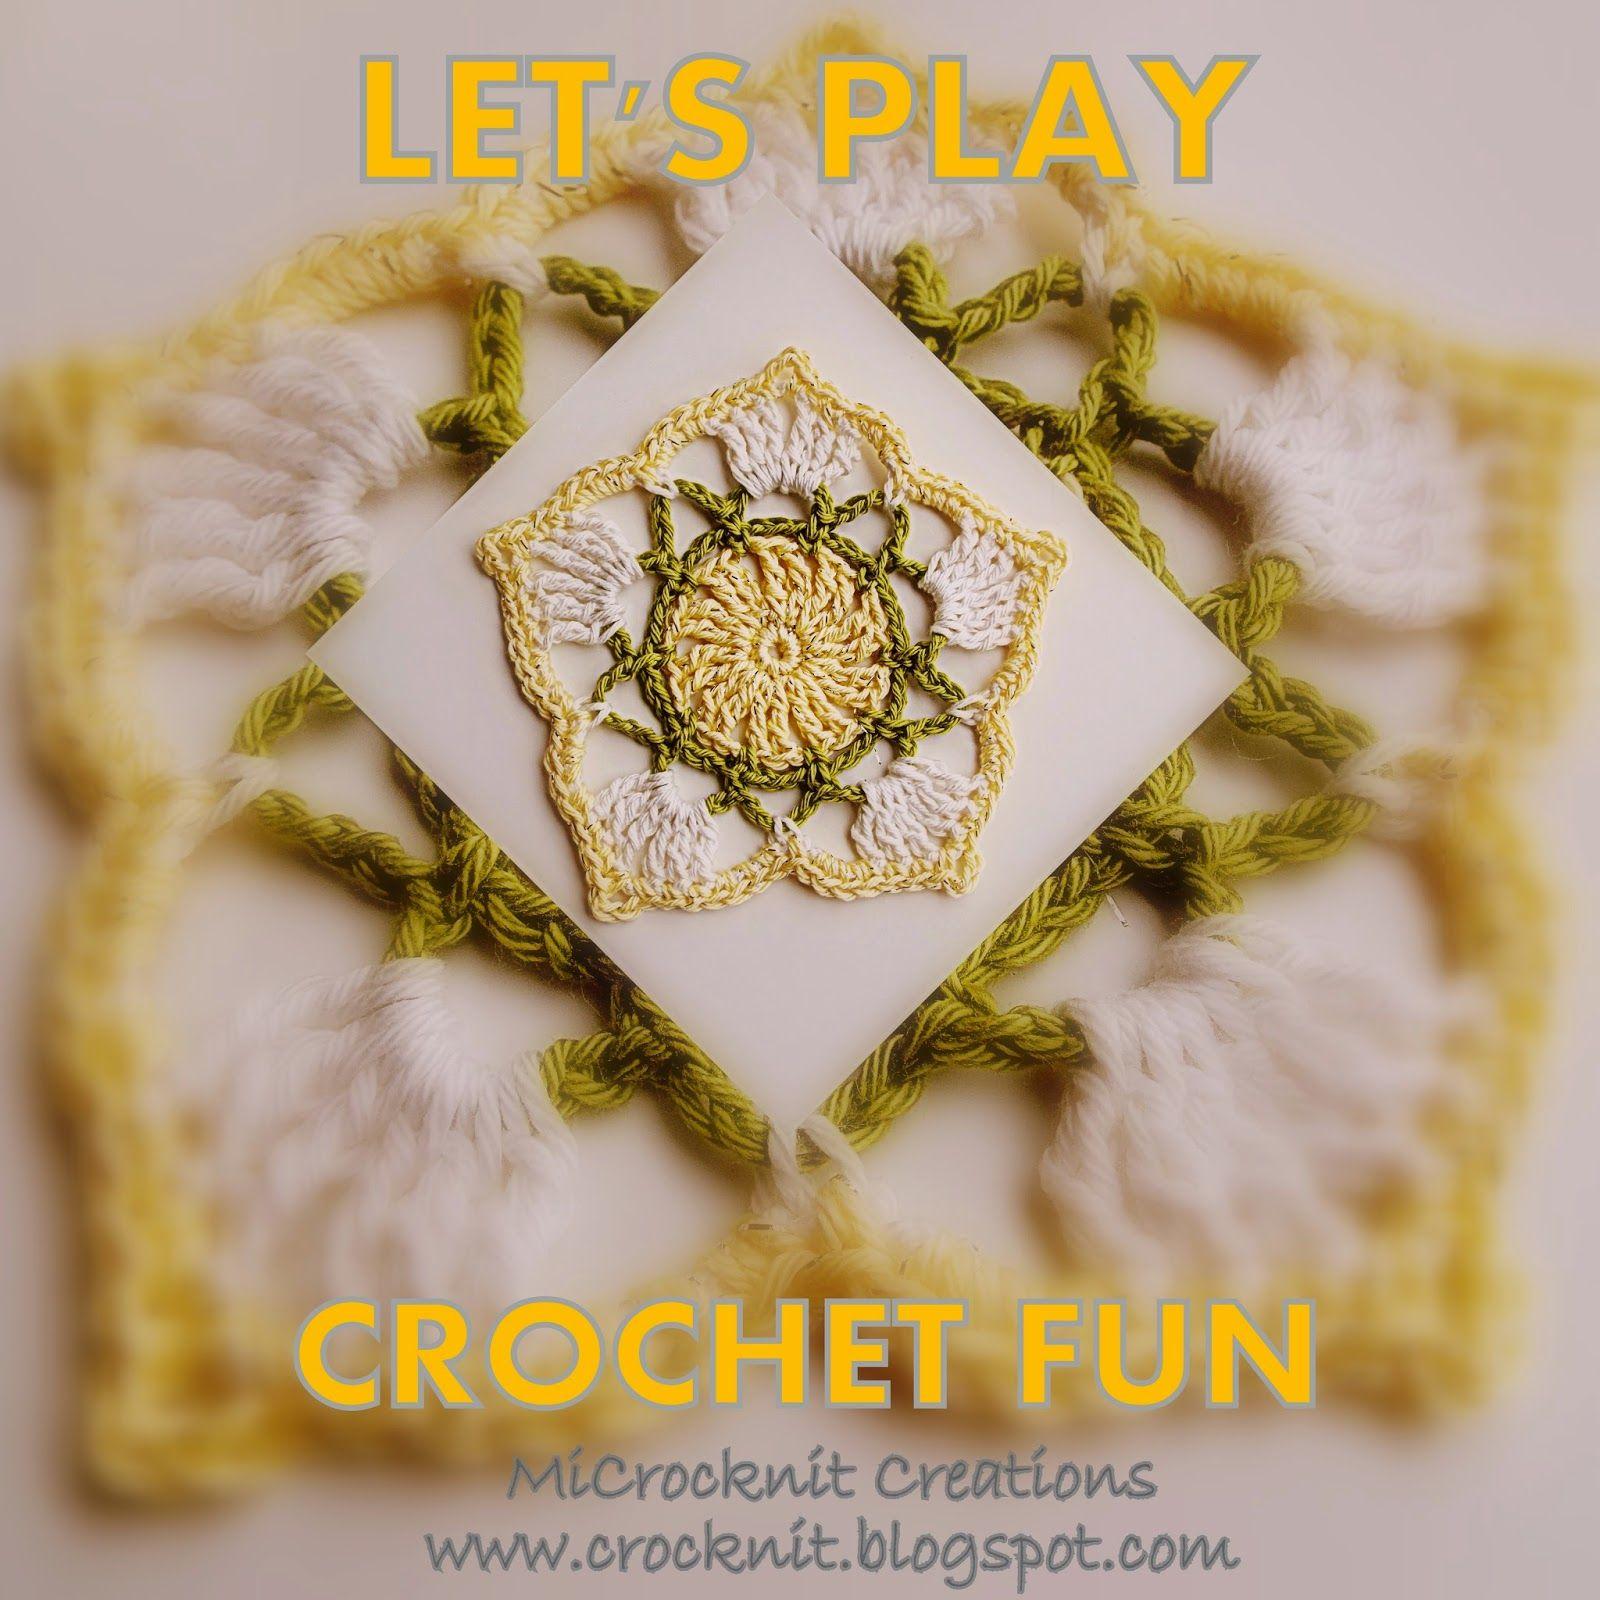 MICROCKNIT CREATIONS: LET\'S PLAY - CROCHET FUN - Free Pattern ...